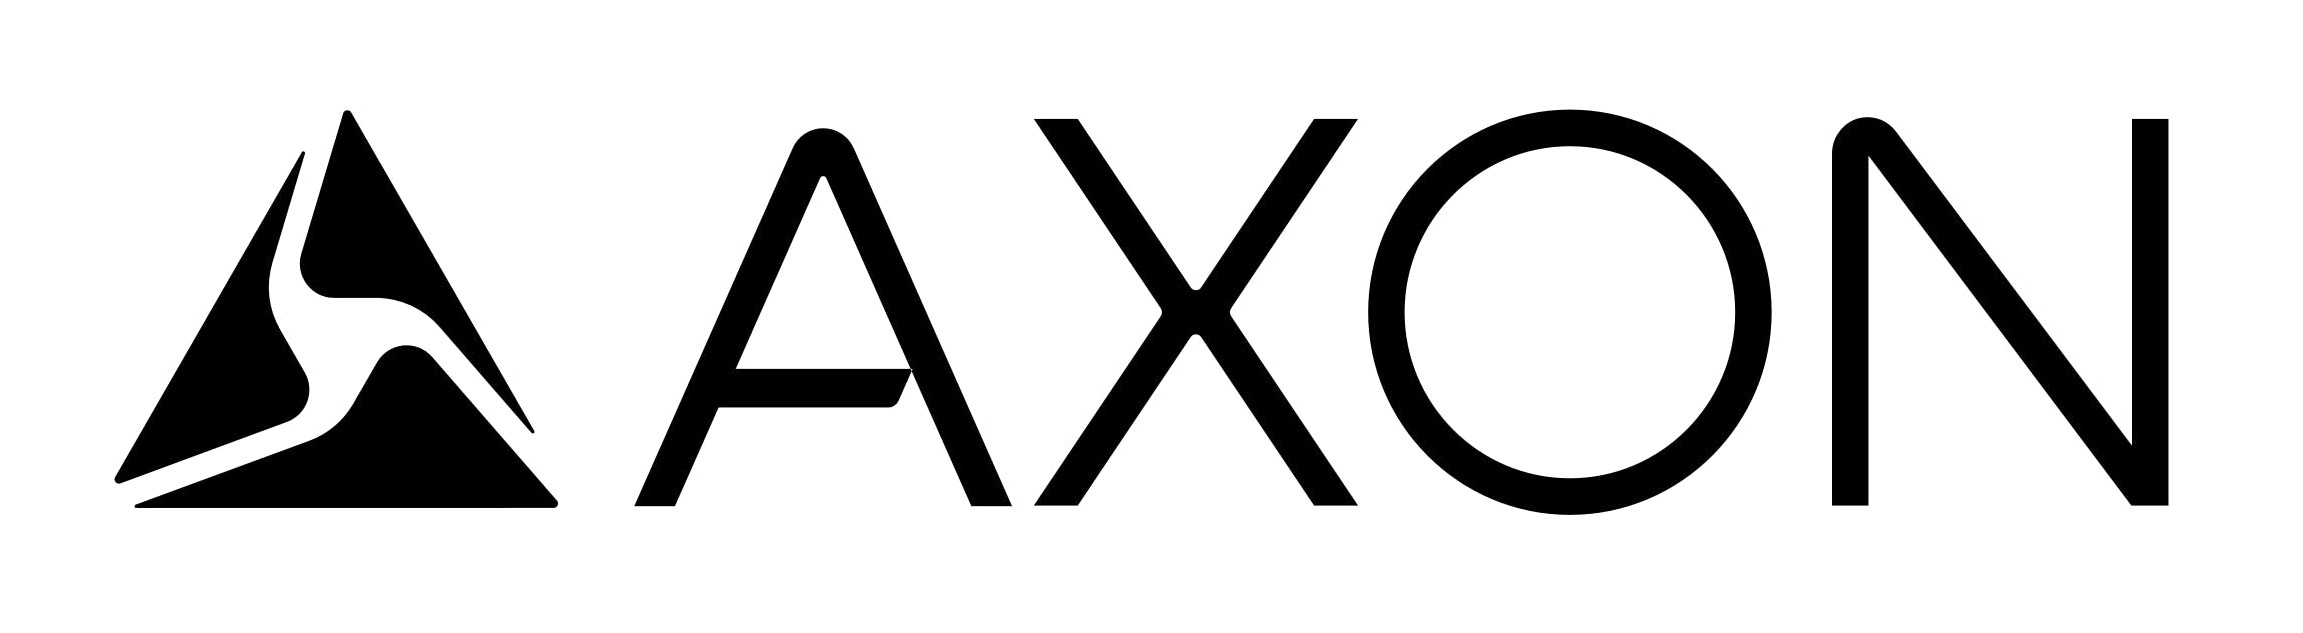 Axon Logo - FAMOUS LOGOS